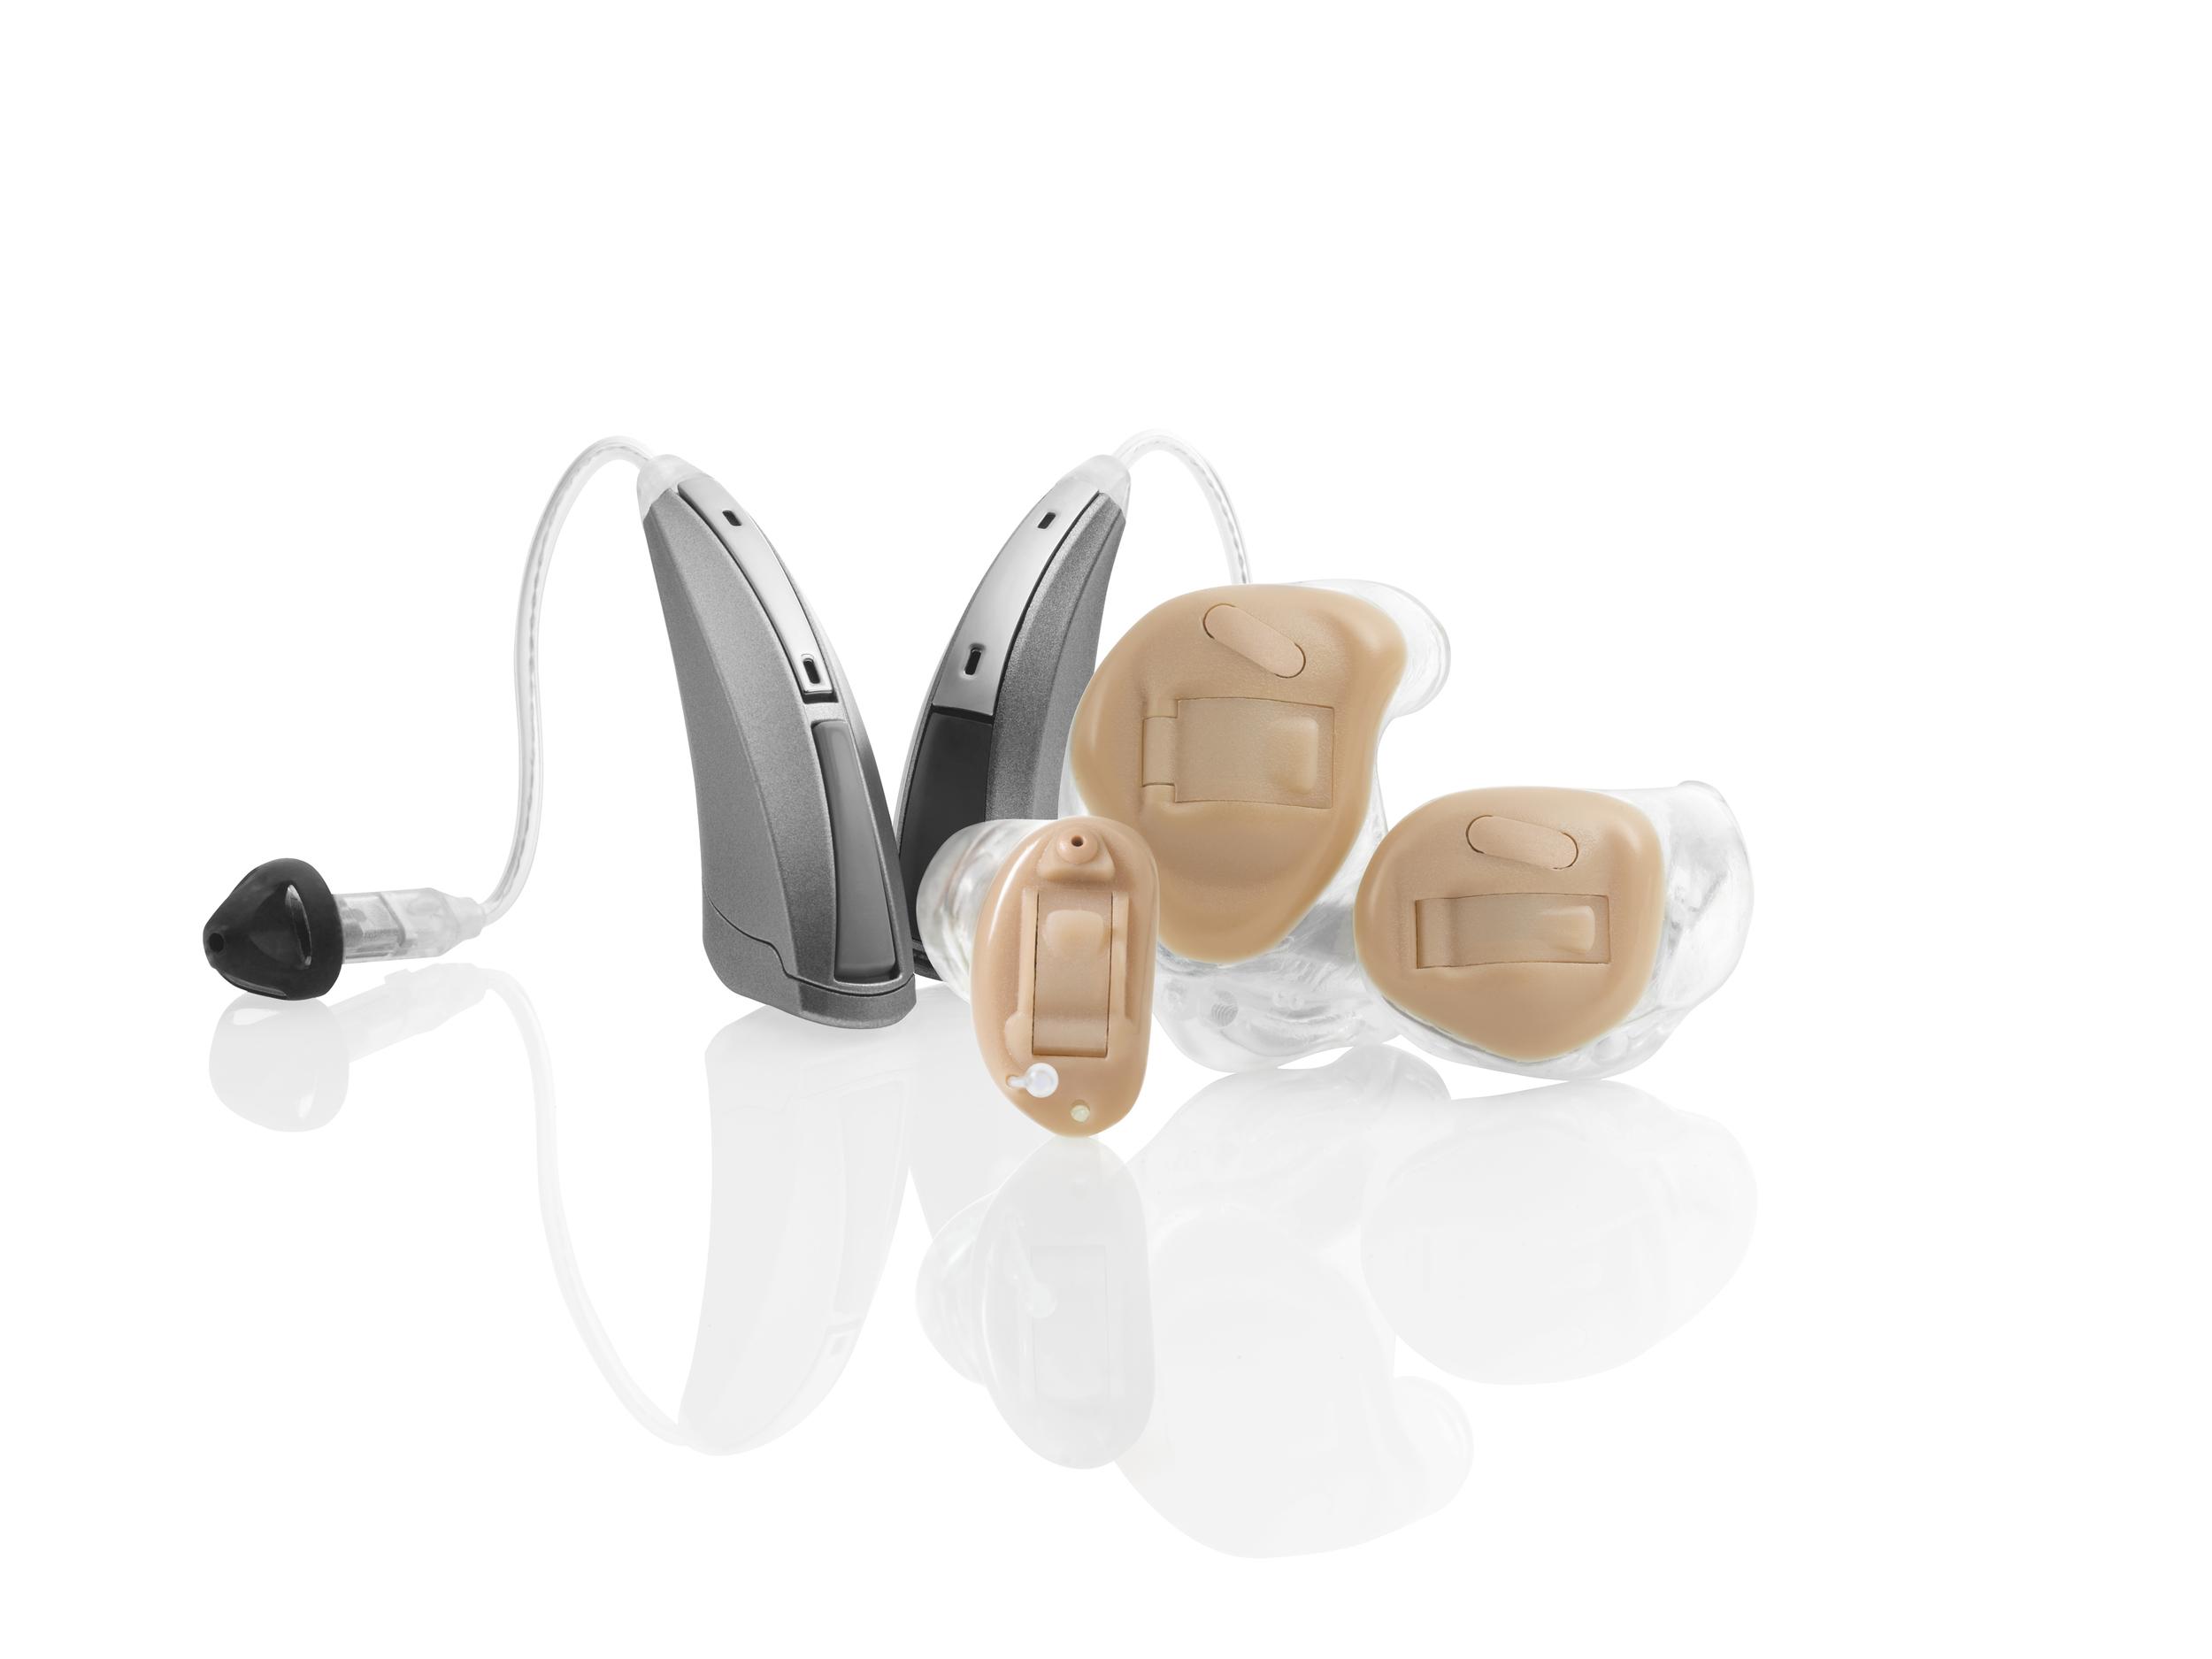 Starkey wireless hearing aids